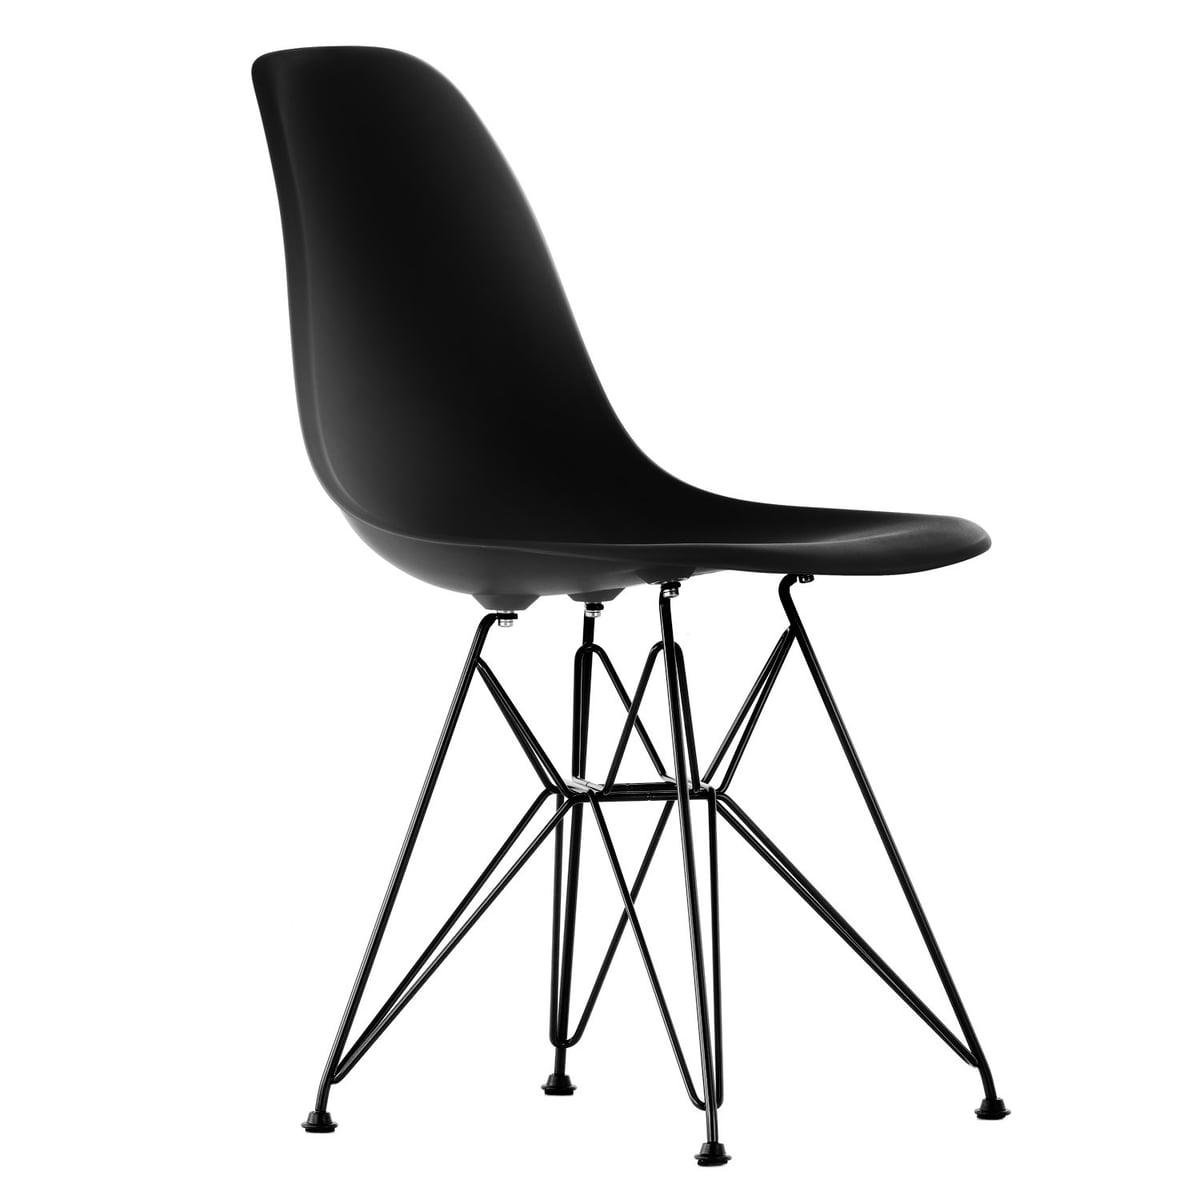 vitra eames plastic side chair dsr h 43 cm pulverbeschichtet basic dark. Black Bedroom Furniture Sets. Home Design Ideas